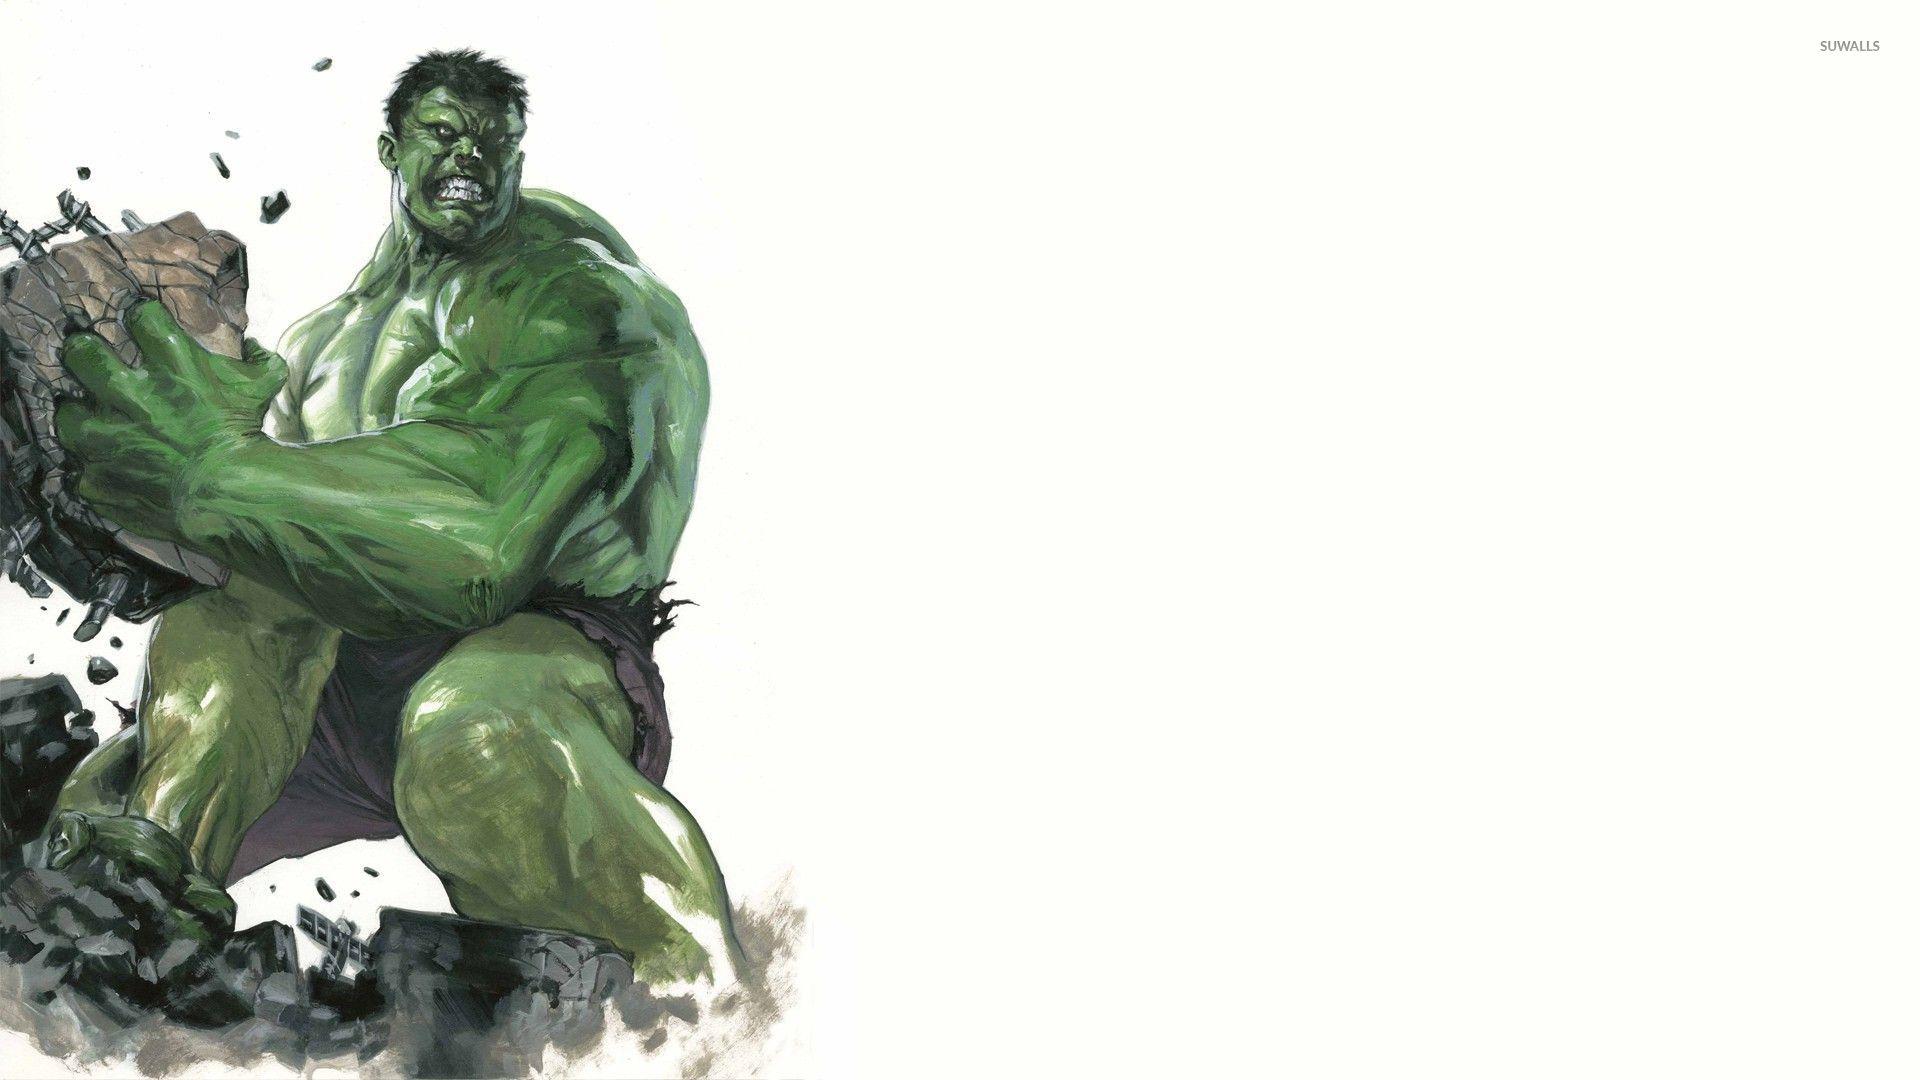 angry hulk throwing rocks -#main